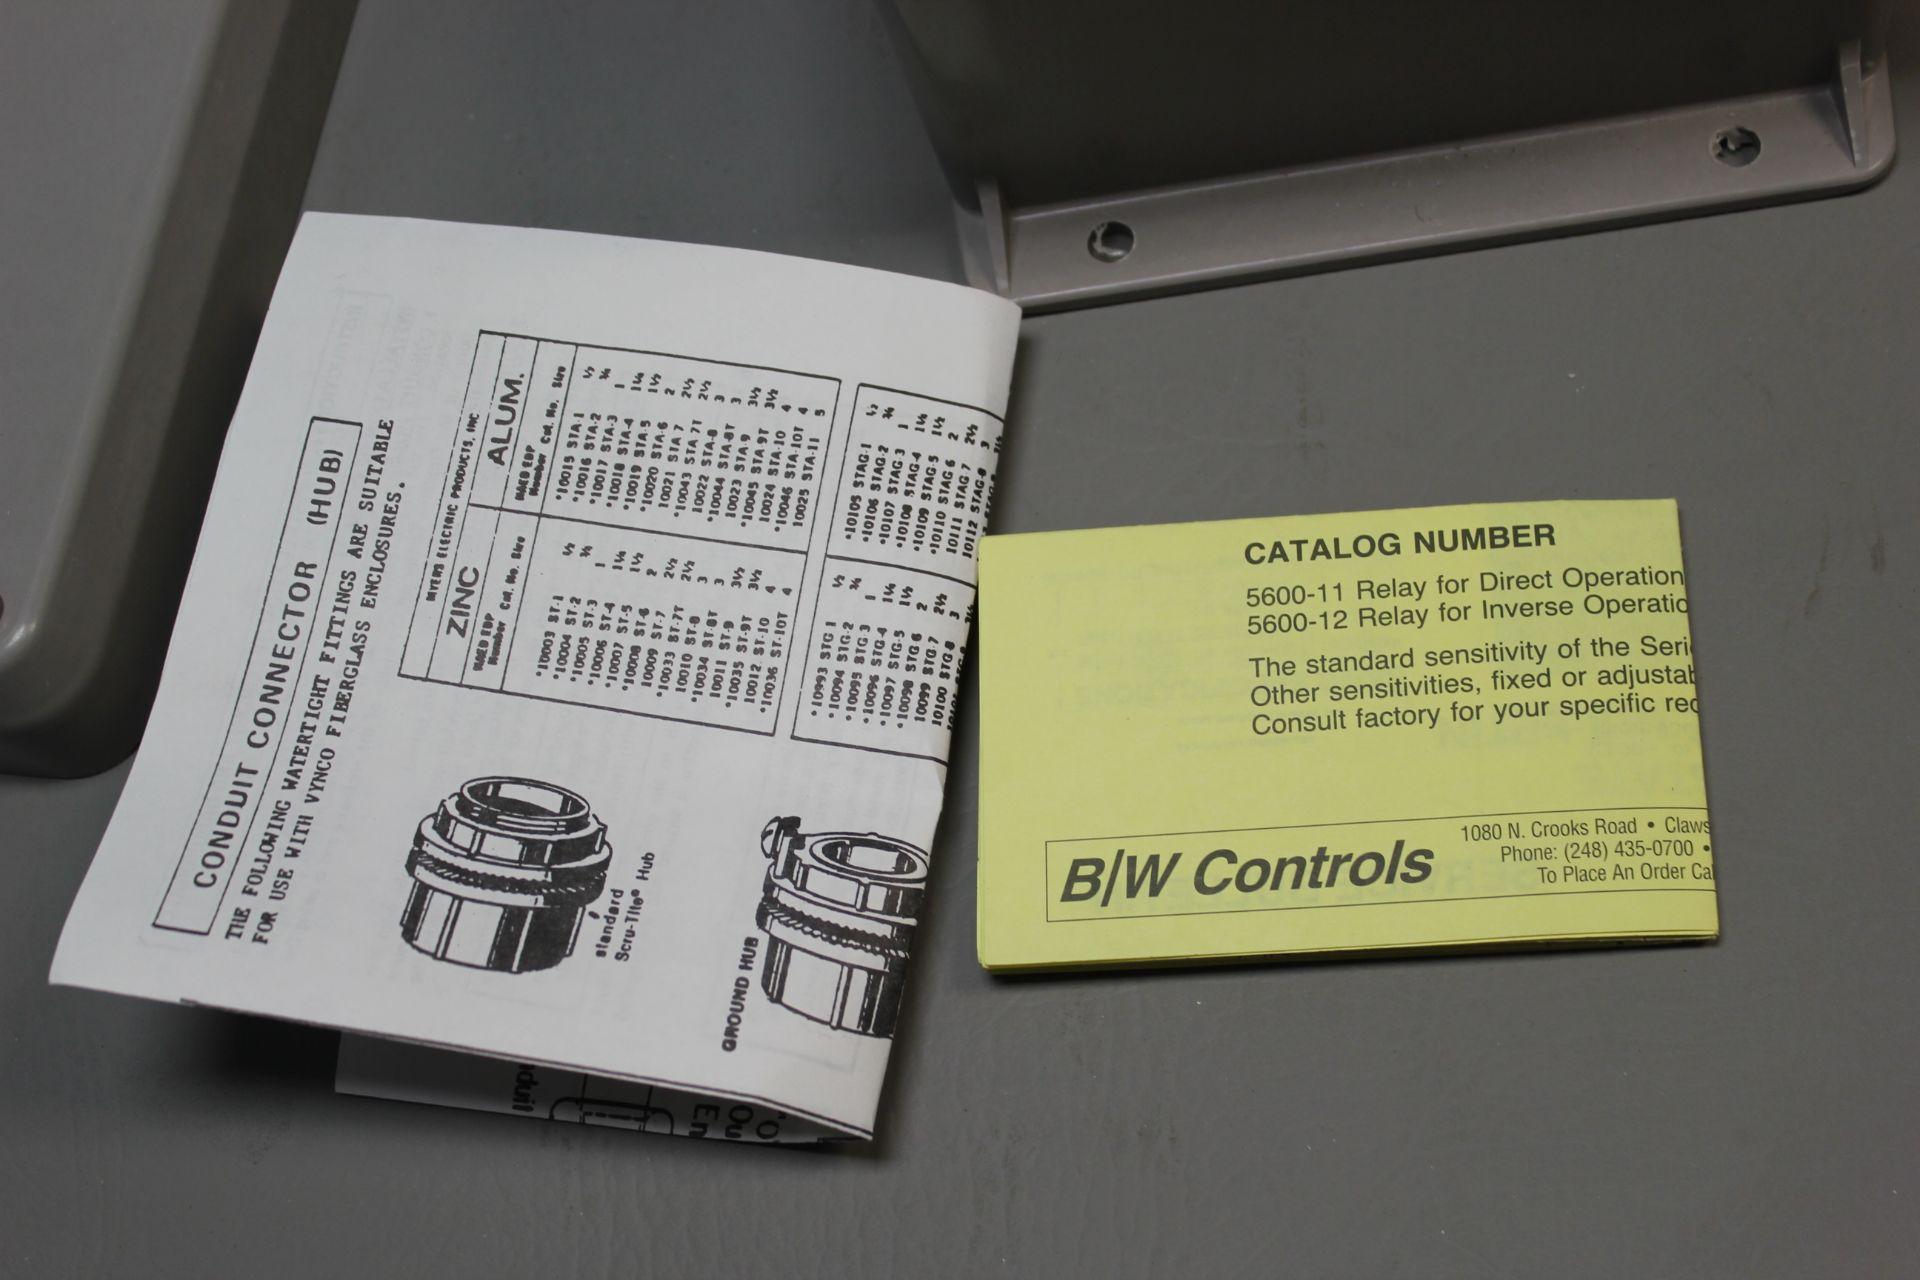 NEW B/W/PATRIOT CONTROL LIQUID LEVEL RELAY BOARD - Image 6 of 9